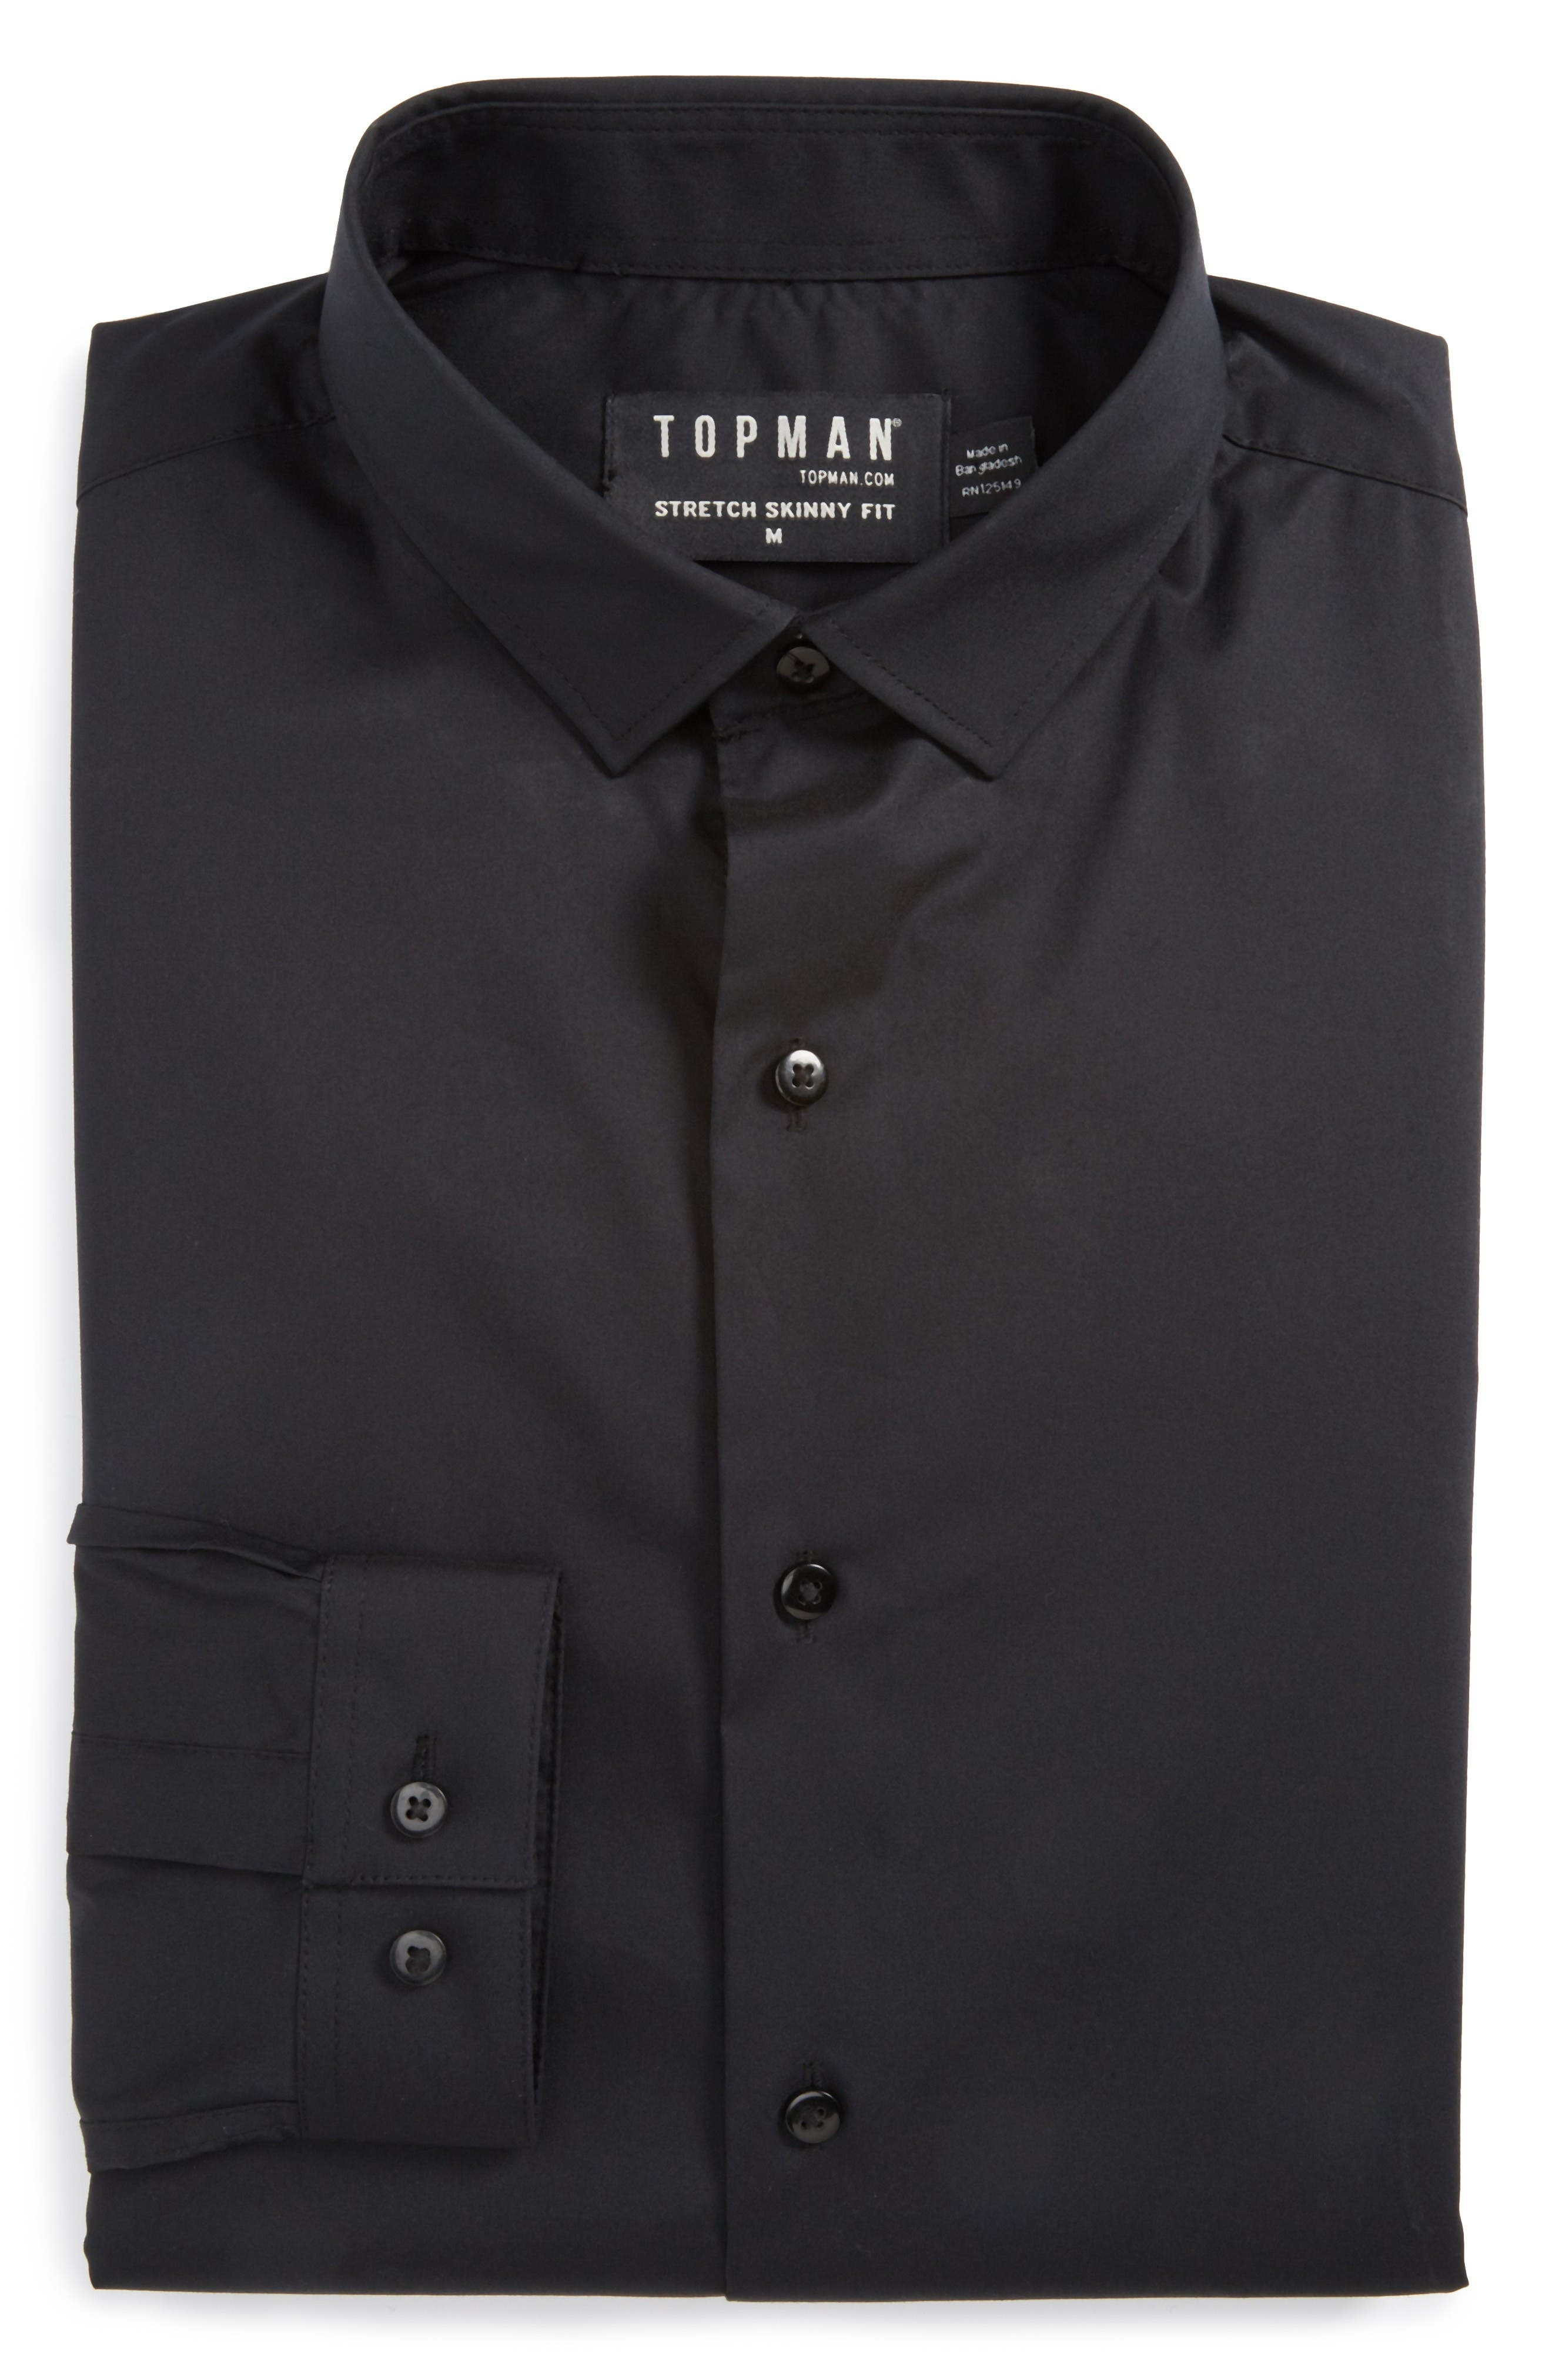 Main Image - Topman Skinny Fit Stretch Dress Shirt